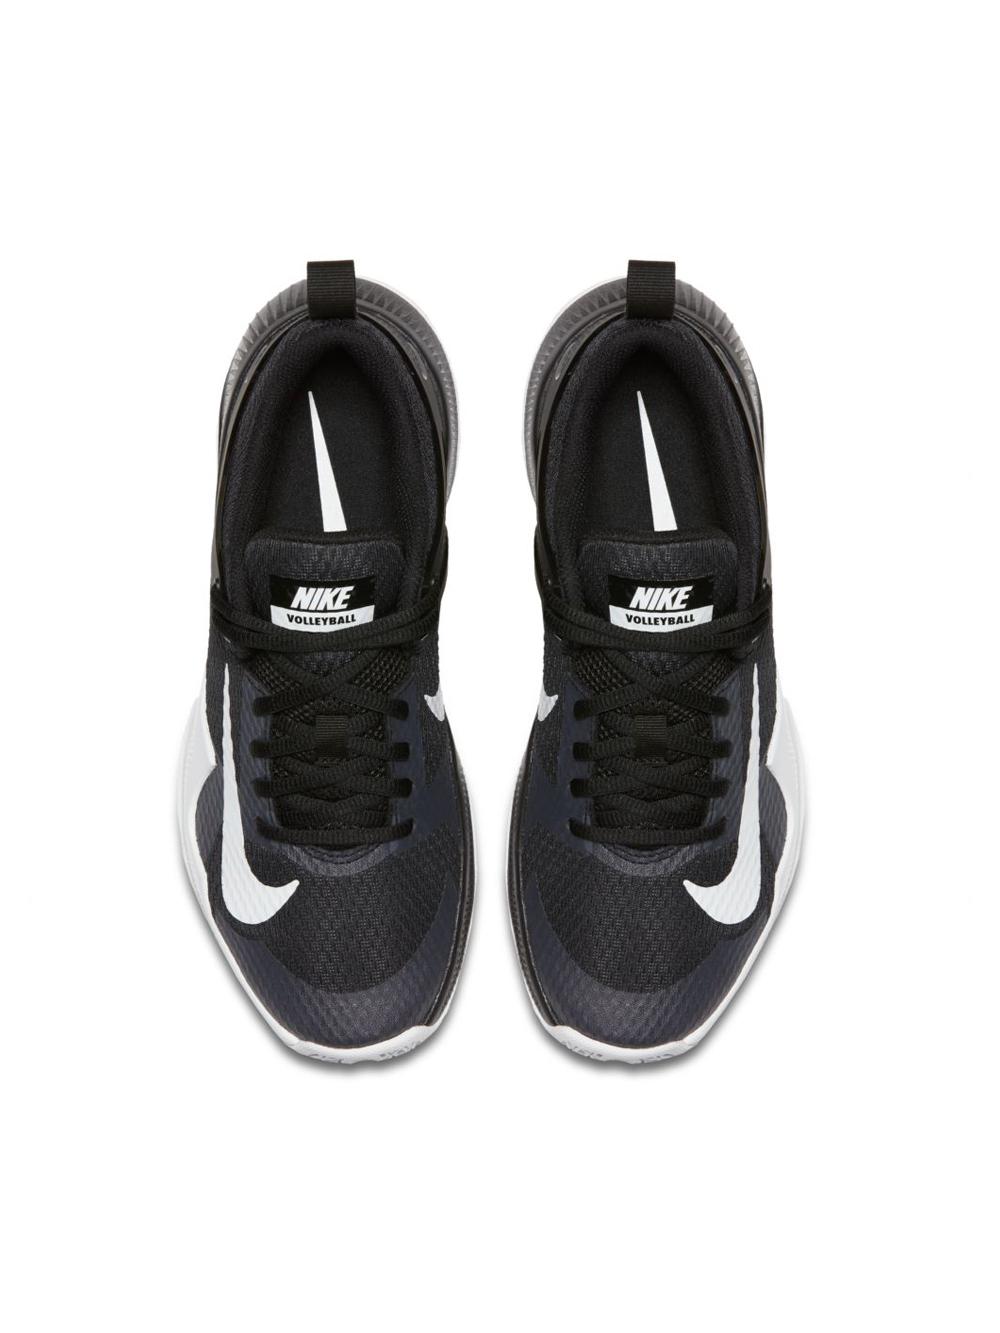 98d26e20953540 Women s Nike Air Zoom Hyperace Shoe - Black White